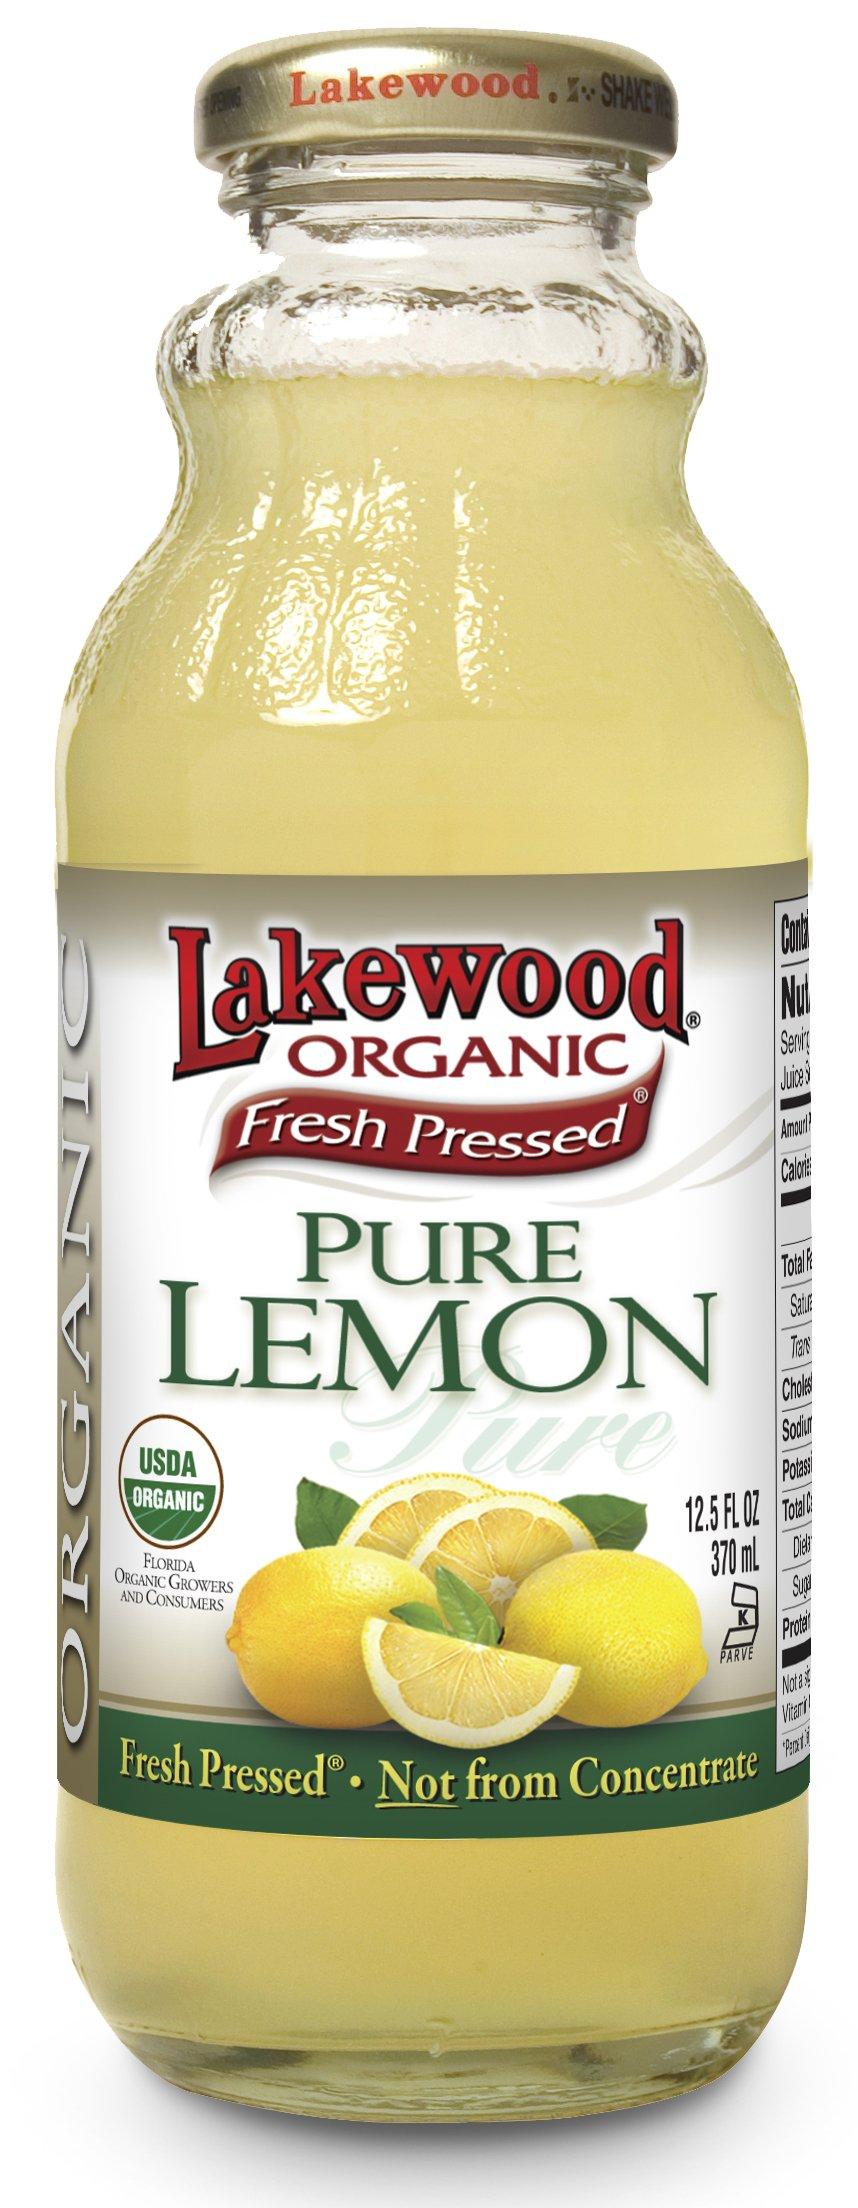 Lakewood Organic PURE Lemon, Fresh Pressed (12.5 oz, 12 pack)